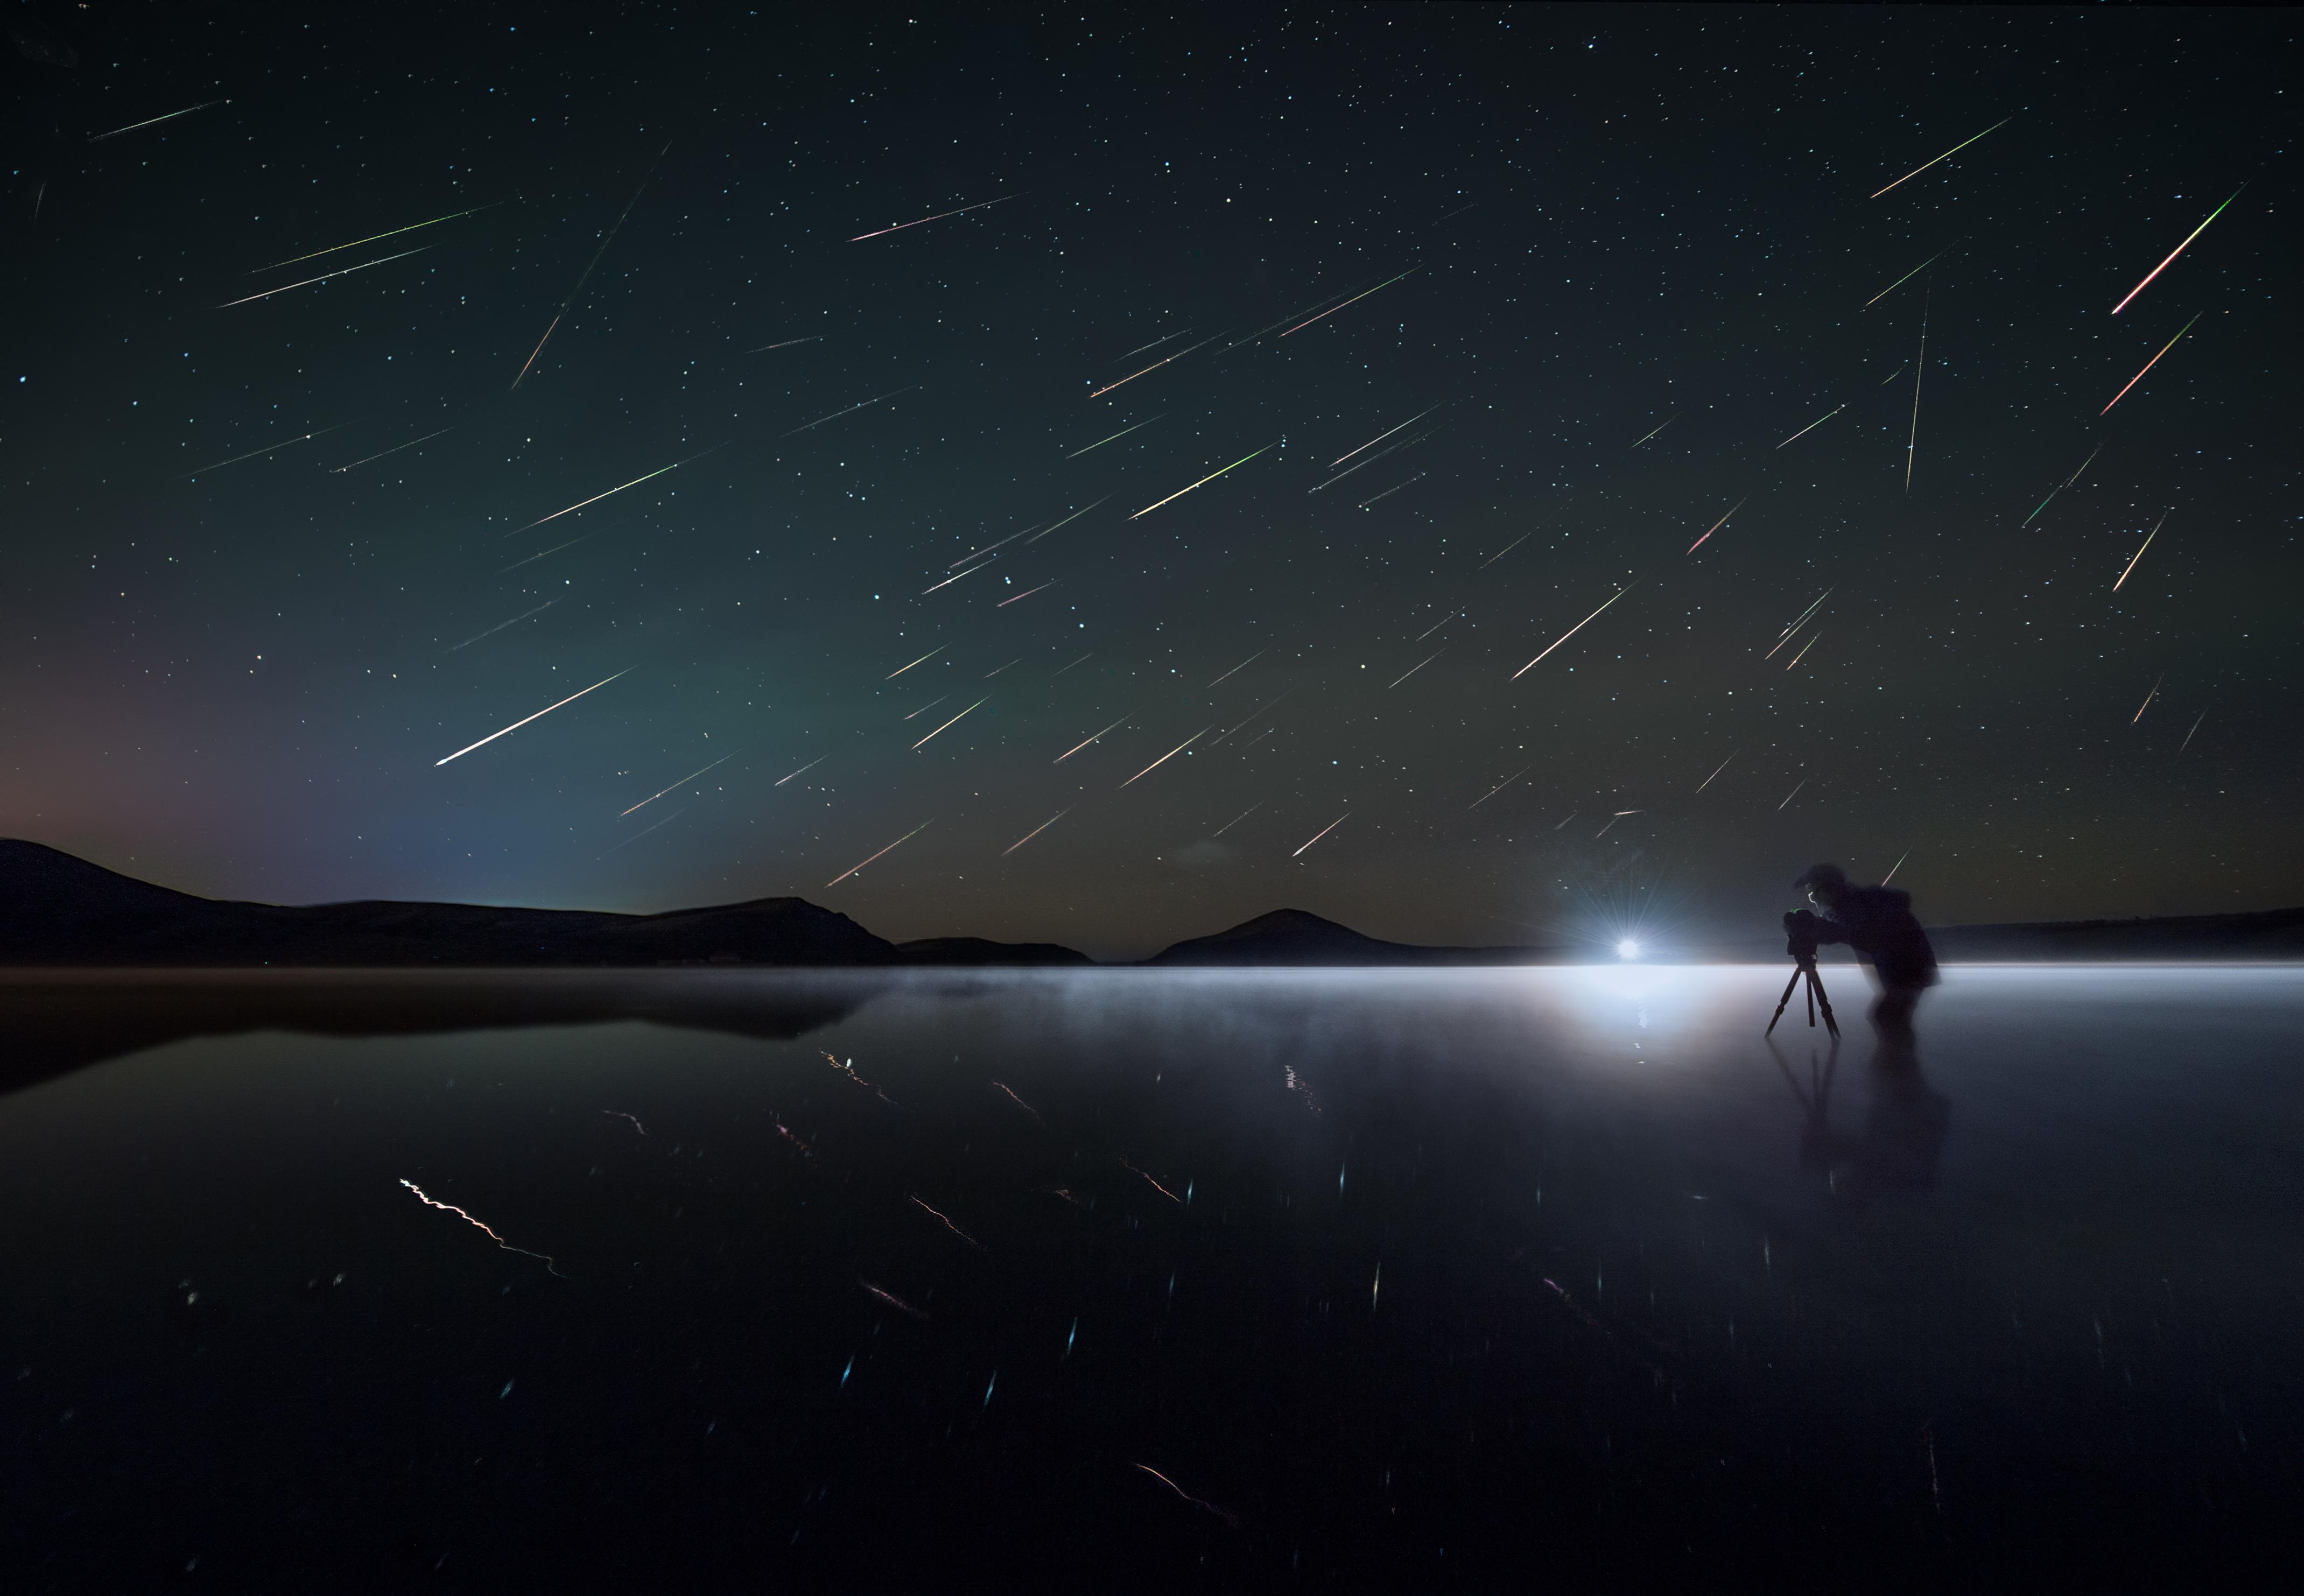 Eta Aquarid meteor shower 2019: When, where and how to photograph the Aquarids